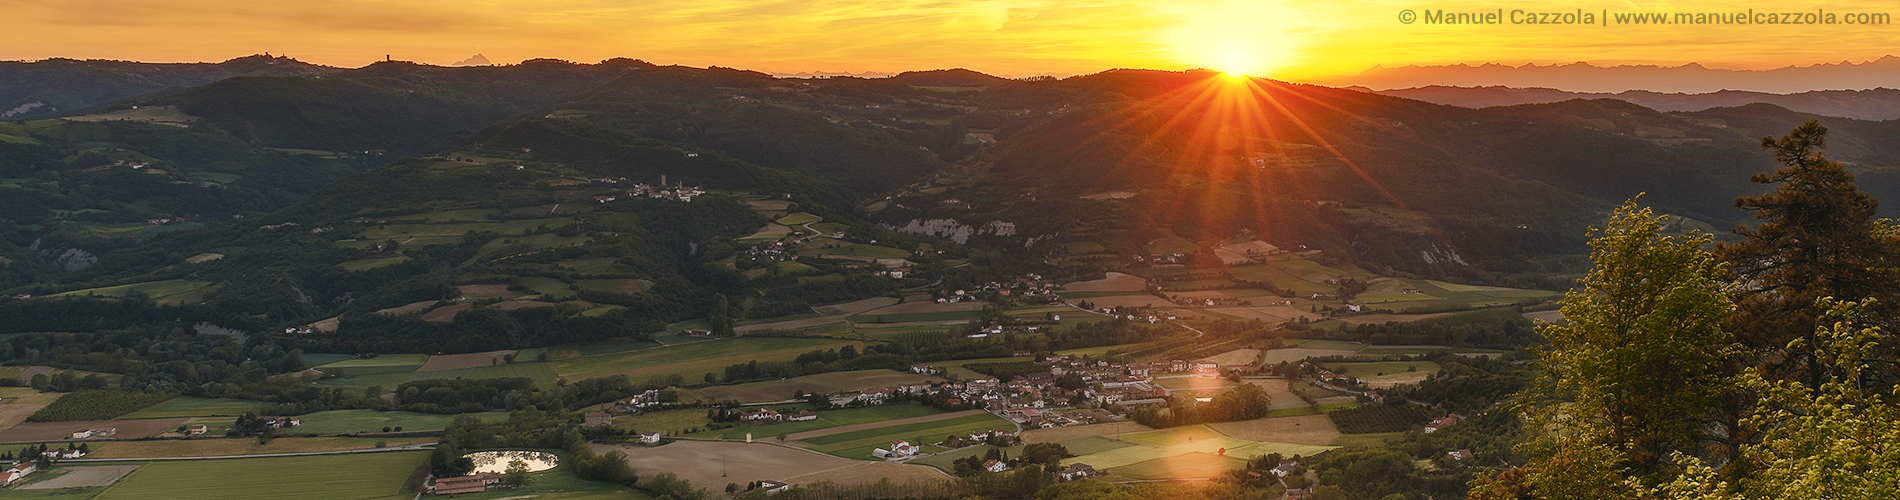 Montechiarodacqui05_Foto_Manuel_Cazzola